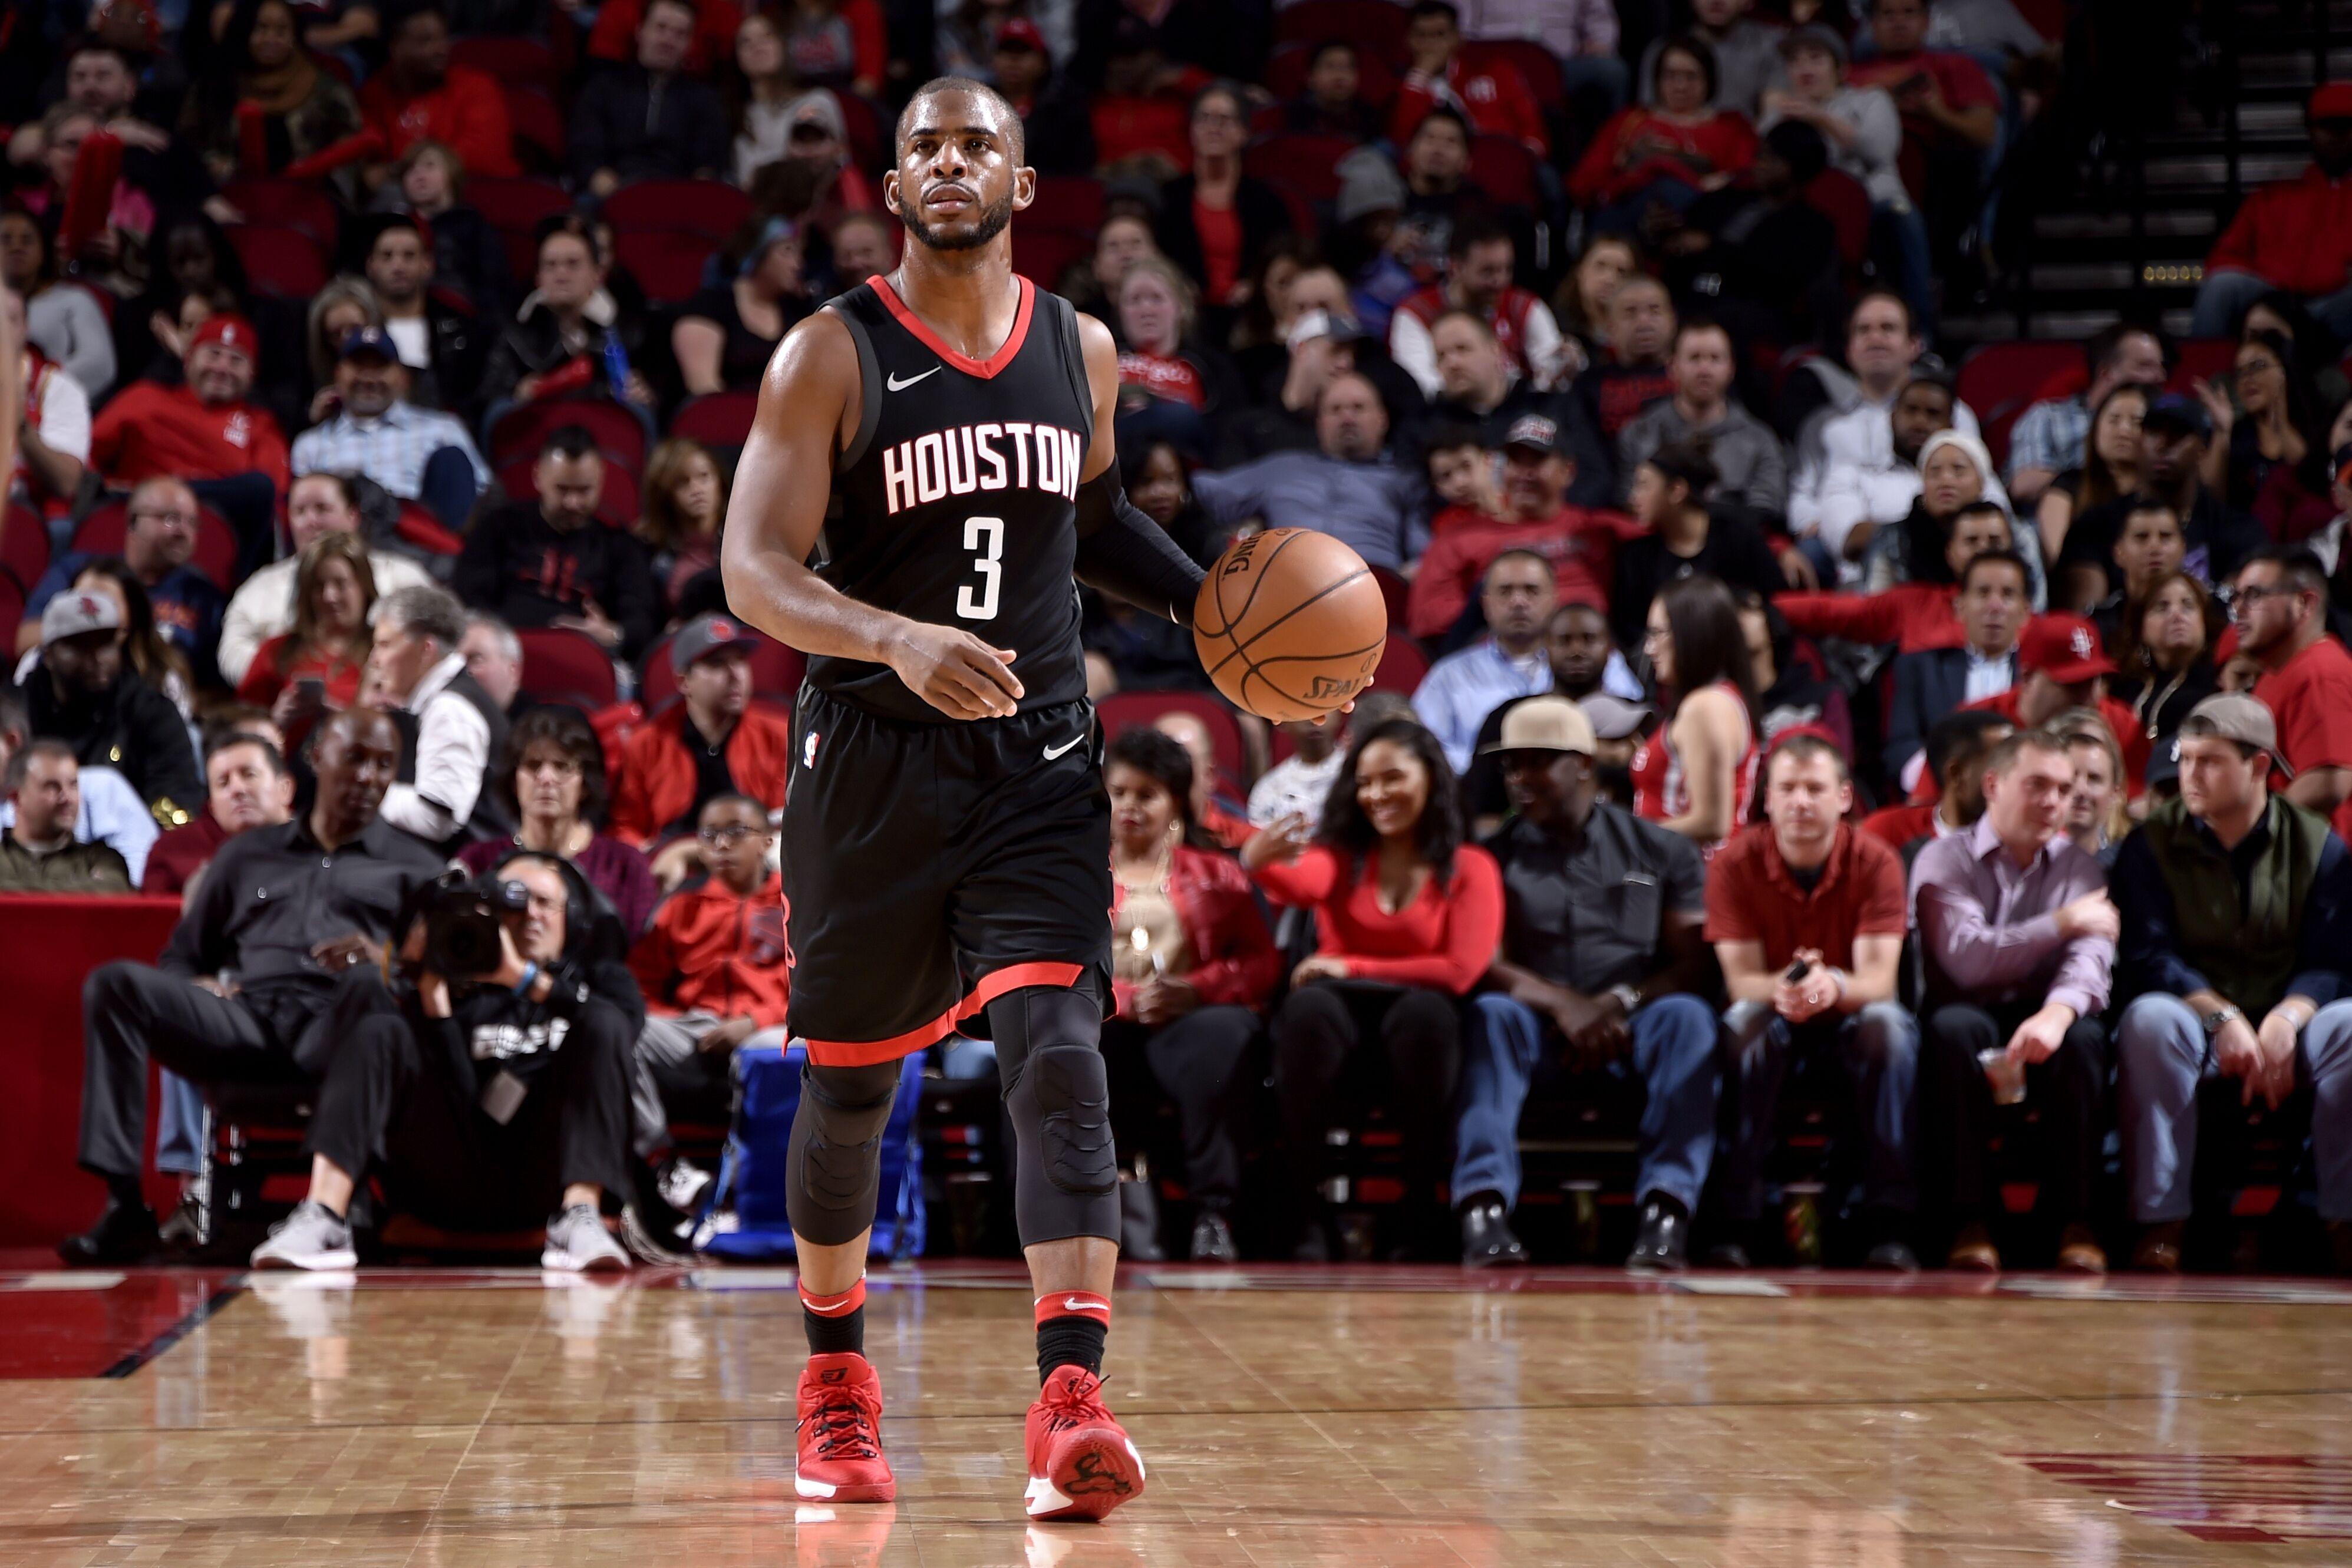 Rockets Vs Suns Hd: 3 Reasons Chris Paul Makes The Houston Rockets Unbeatable